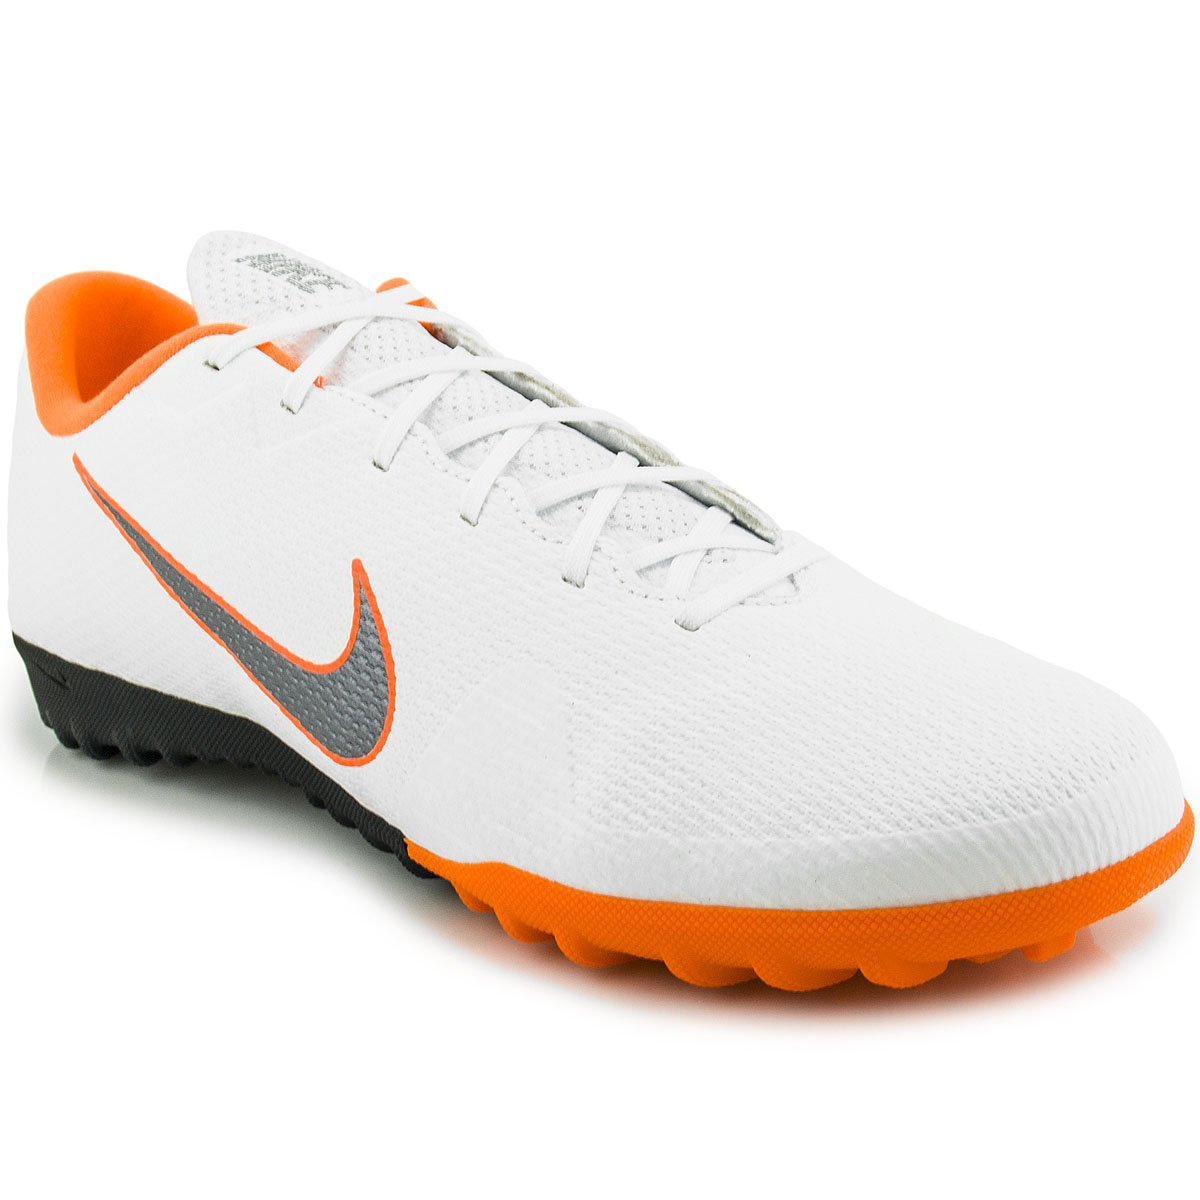 Chuteira Nike MercurialX Vapor 12 Academy TF  5ae8e4bfc0ea9